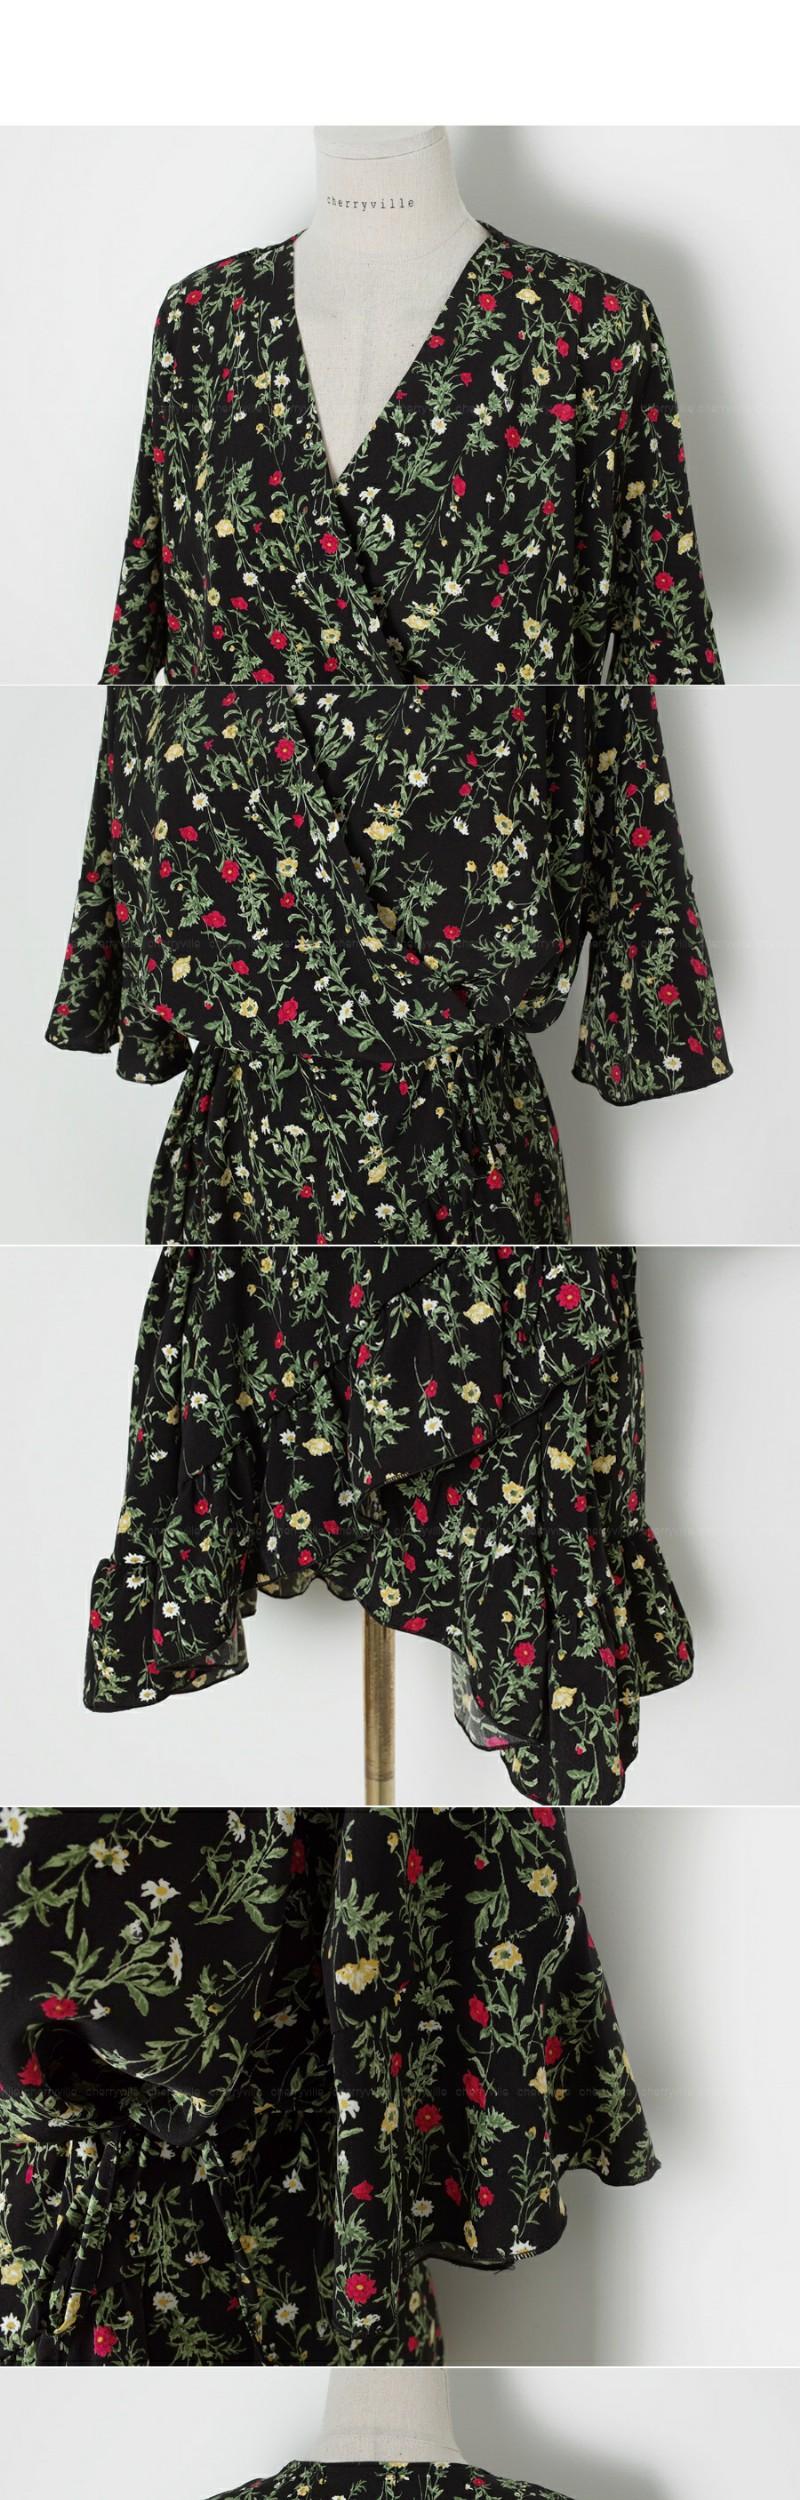 Aura pretty dress